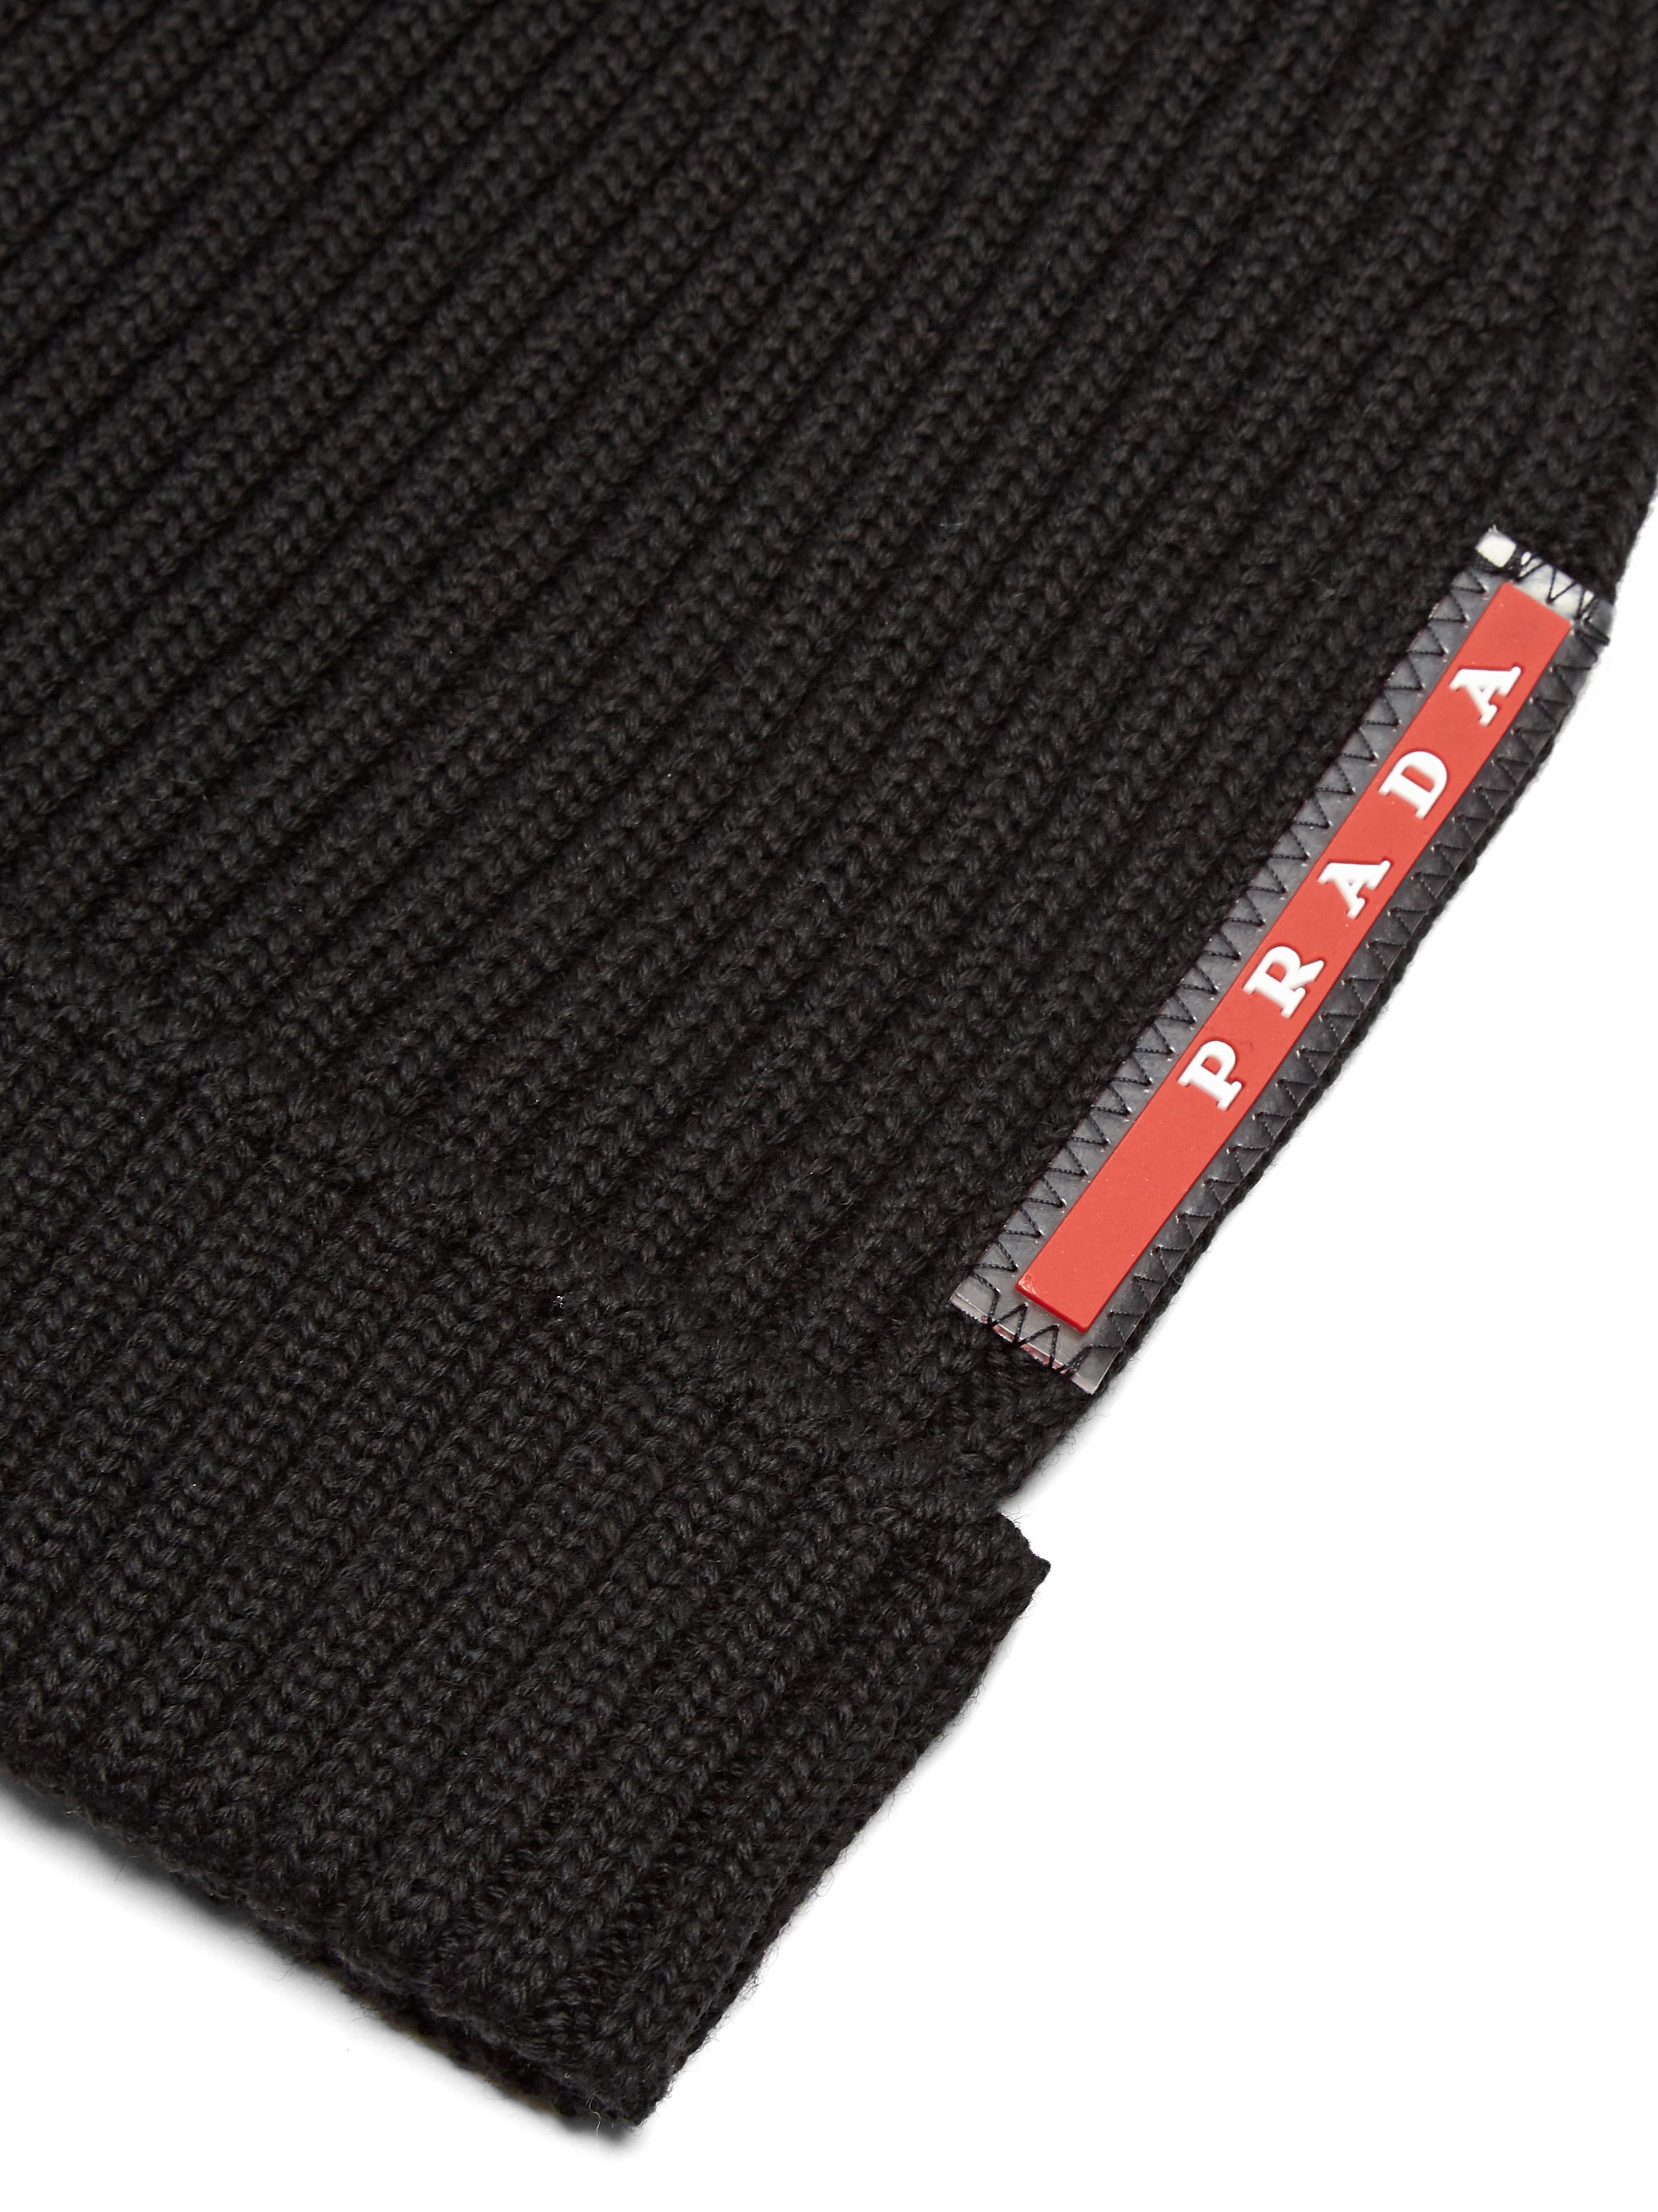 Prada Ribbed-knit Beanie Hat in Black for Men - Lyst f966fb92bf1